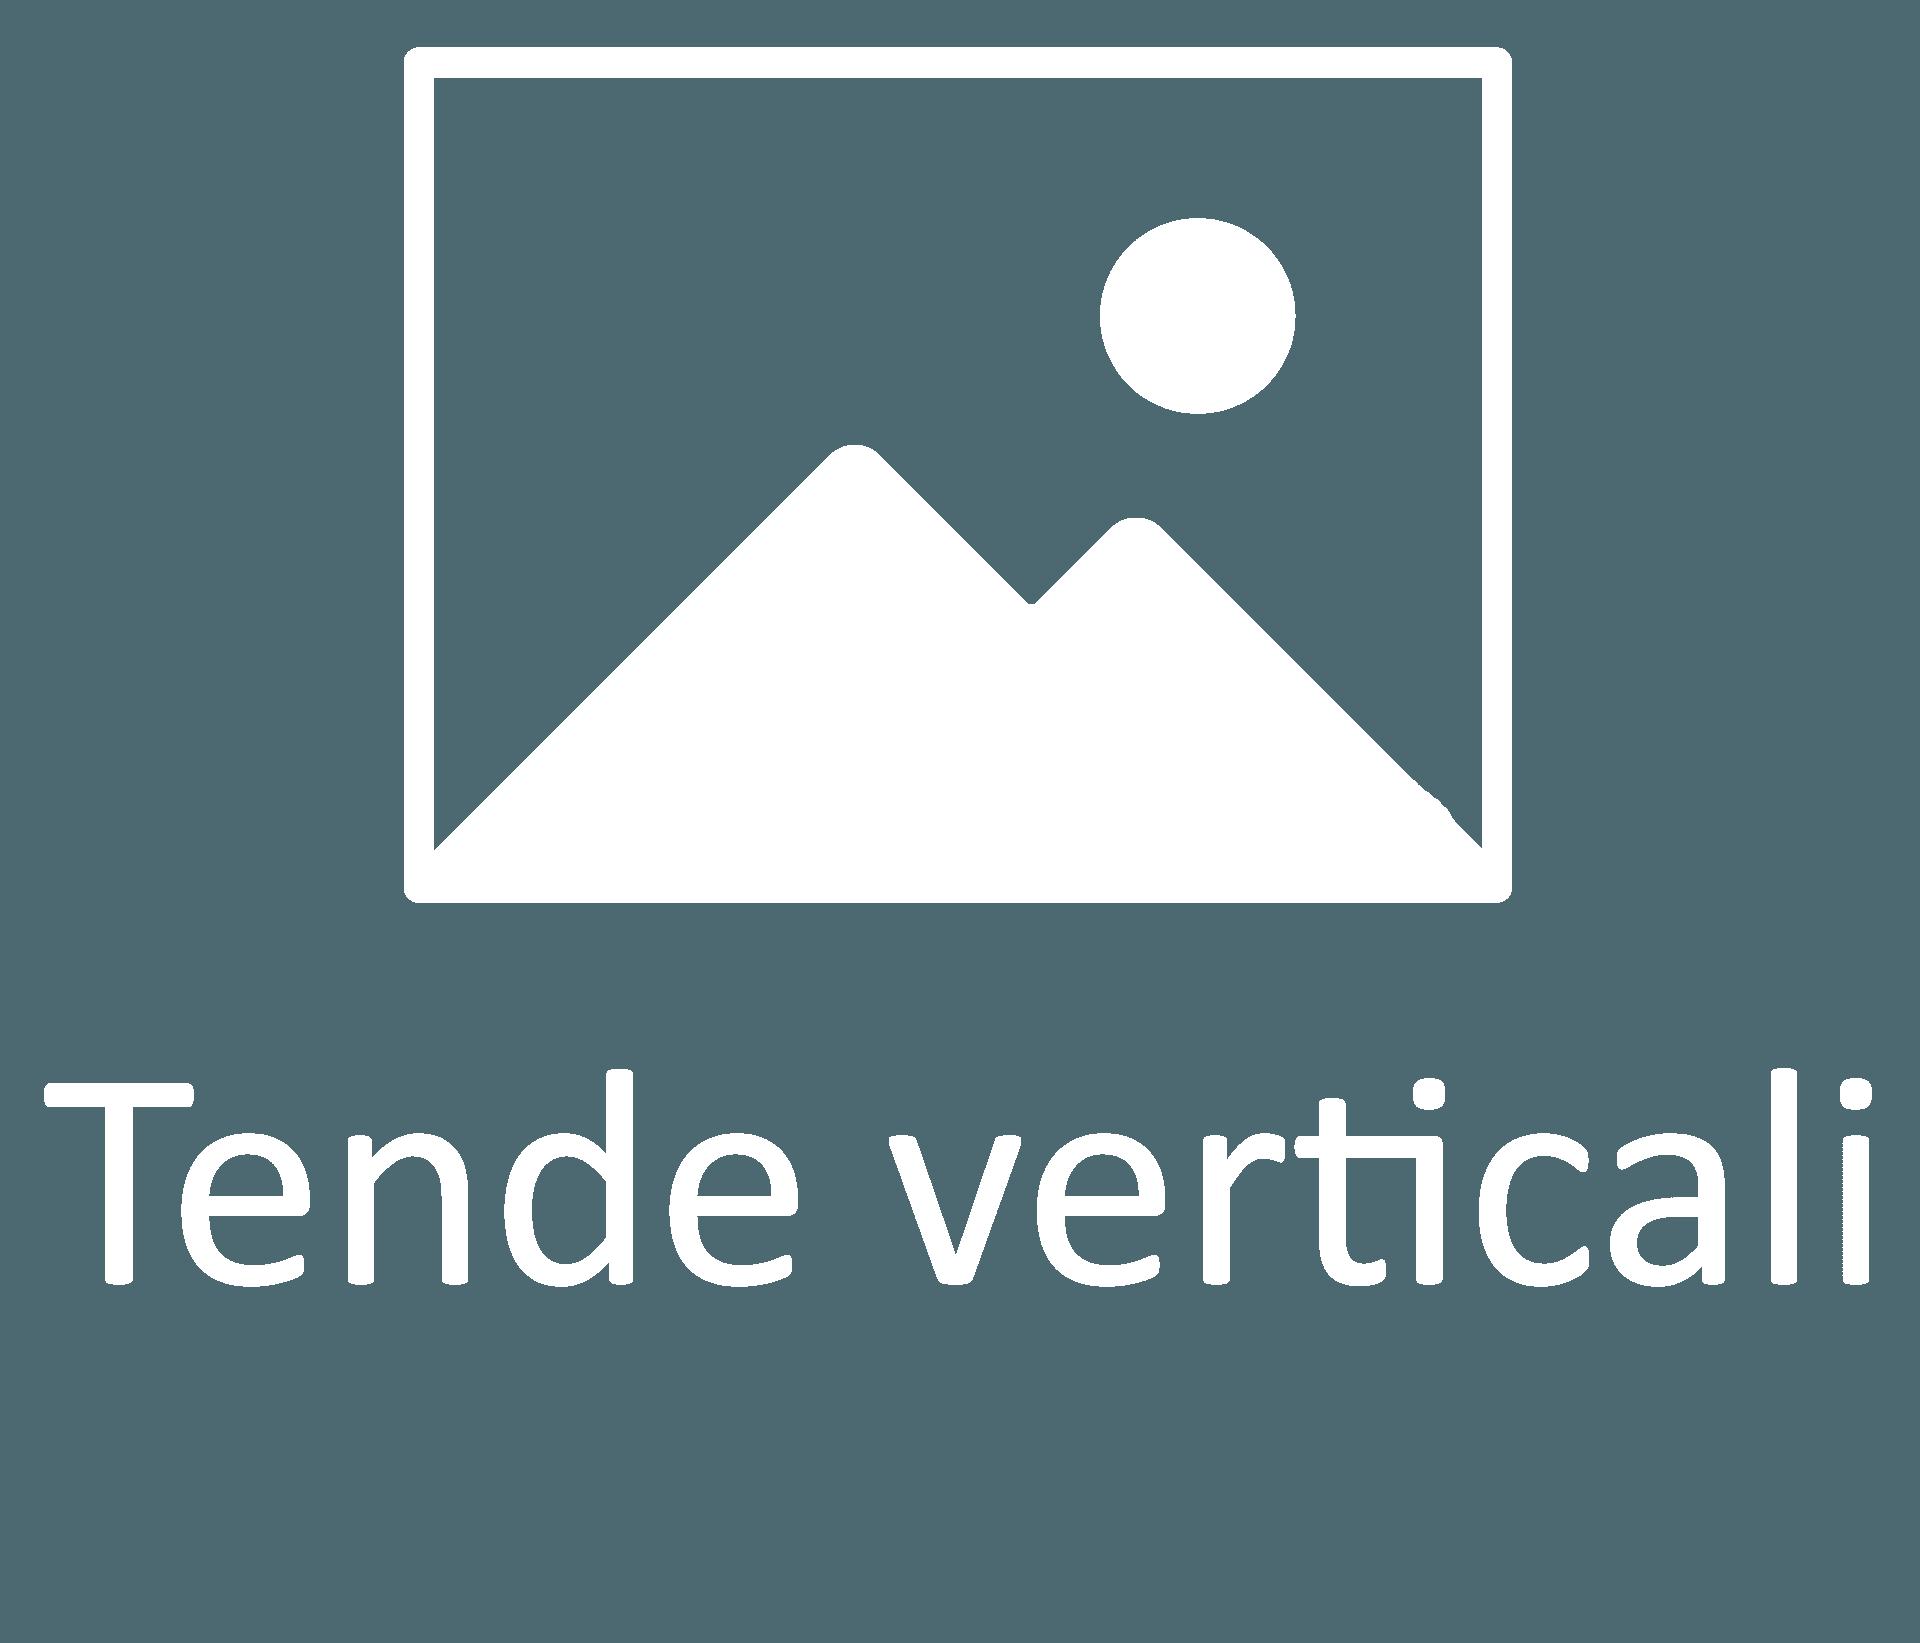 tende verticali